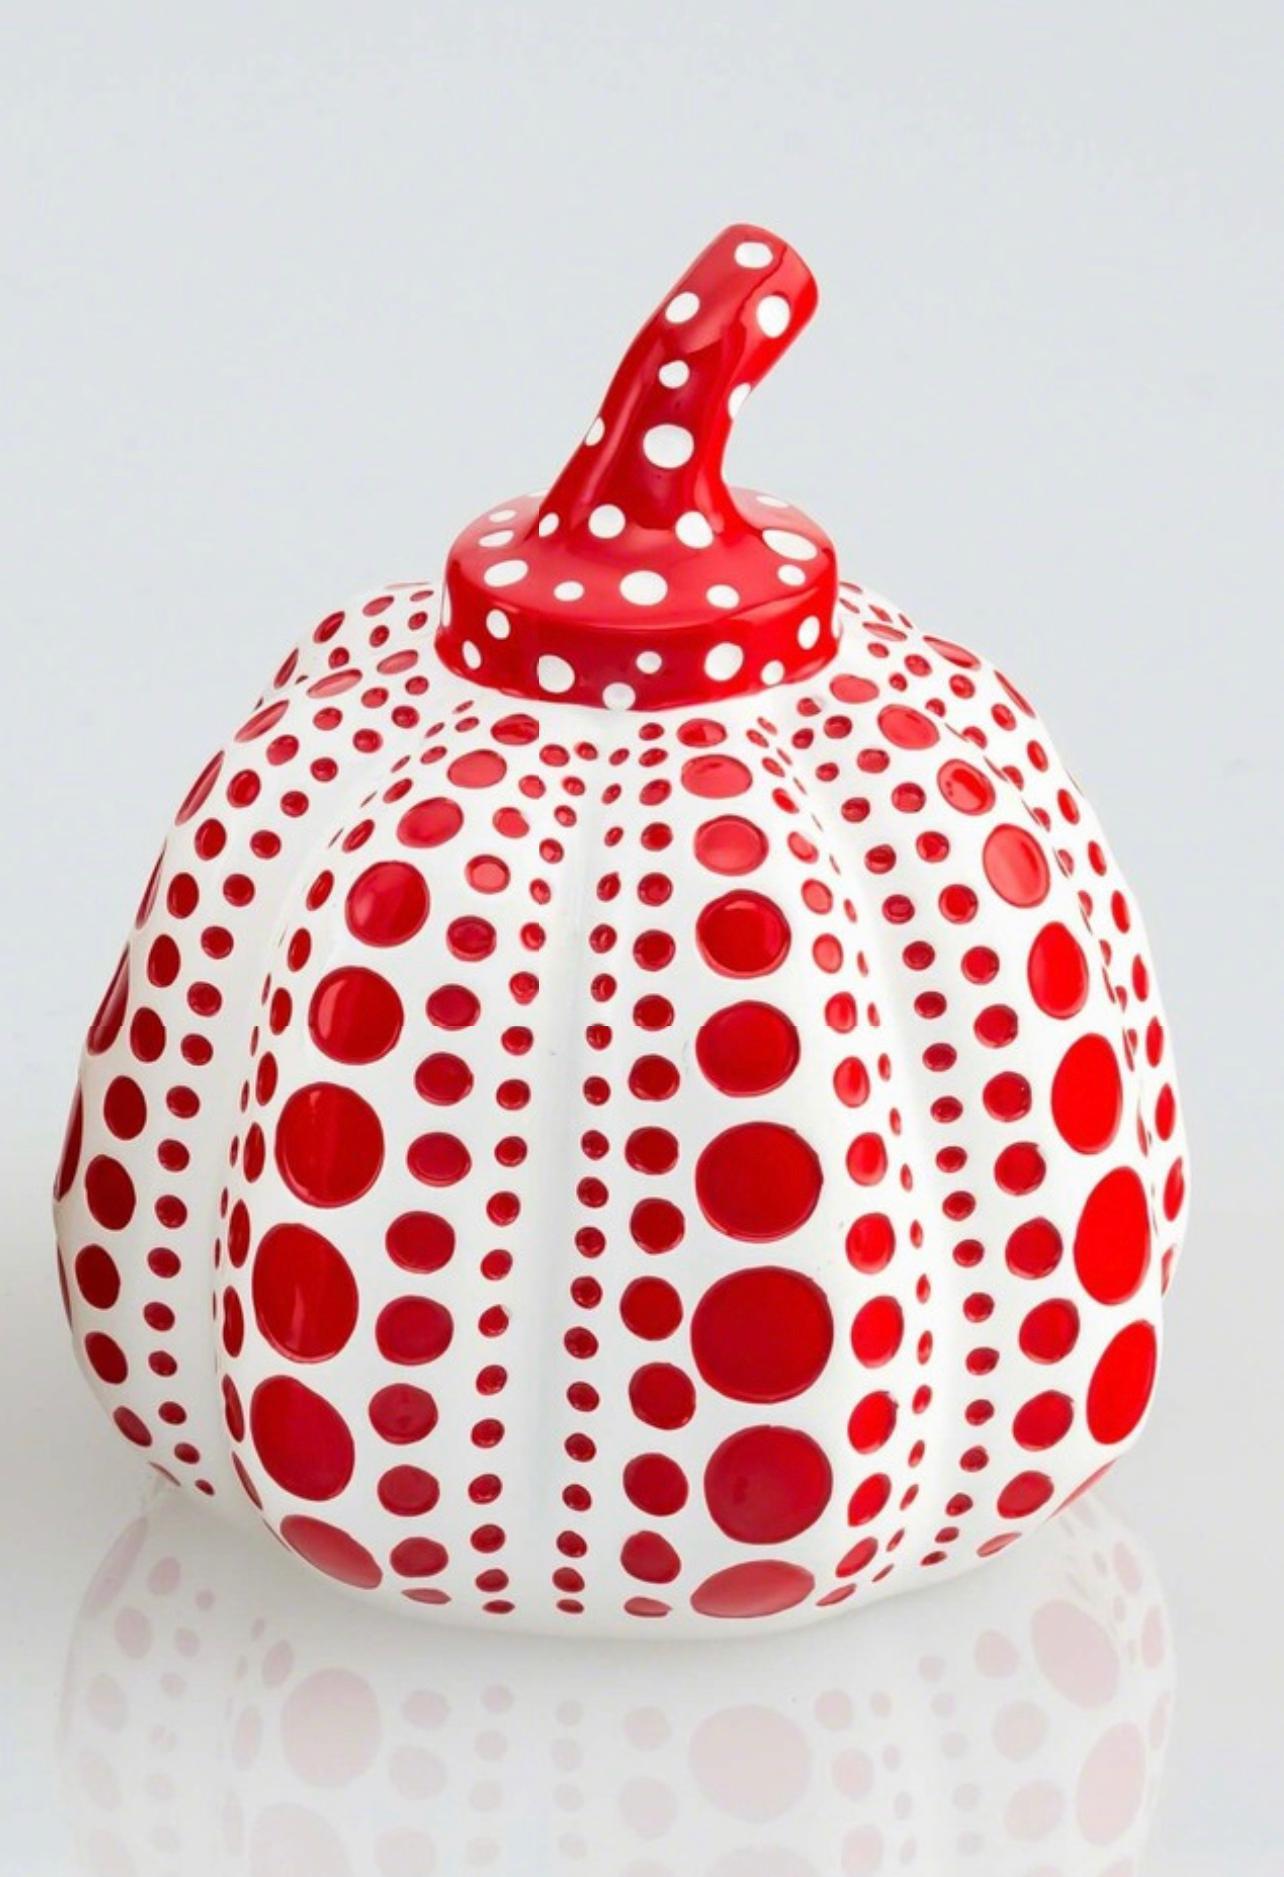 Pumpkin (Red & White), Painted Cast Resin Sculpture, Yayoi Kusama